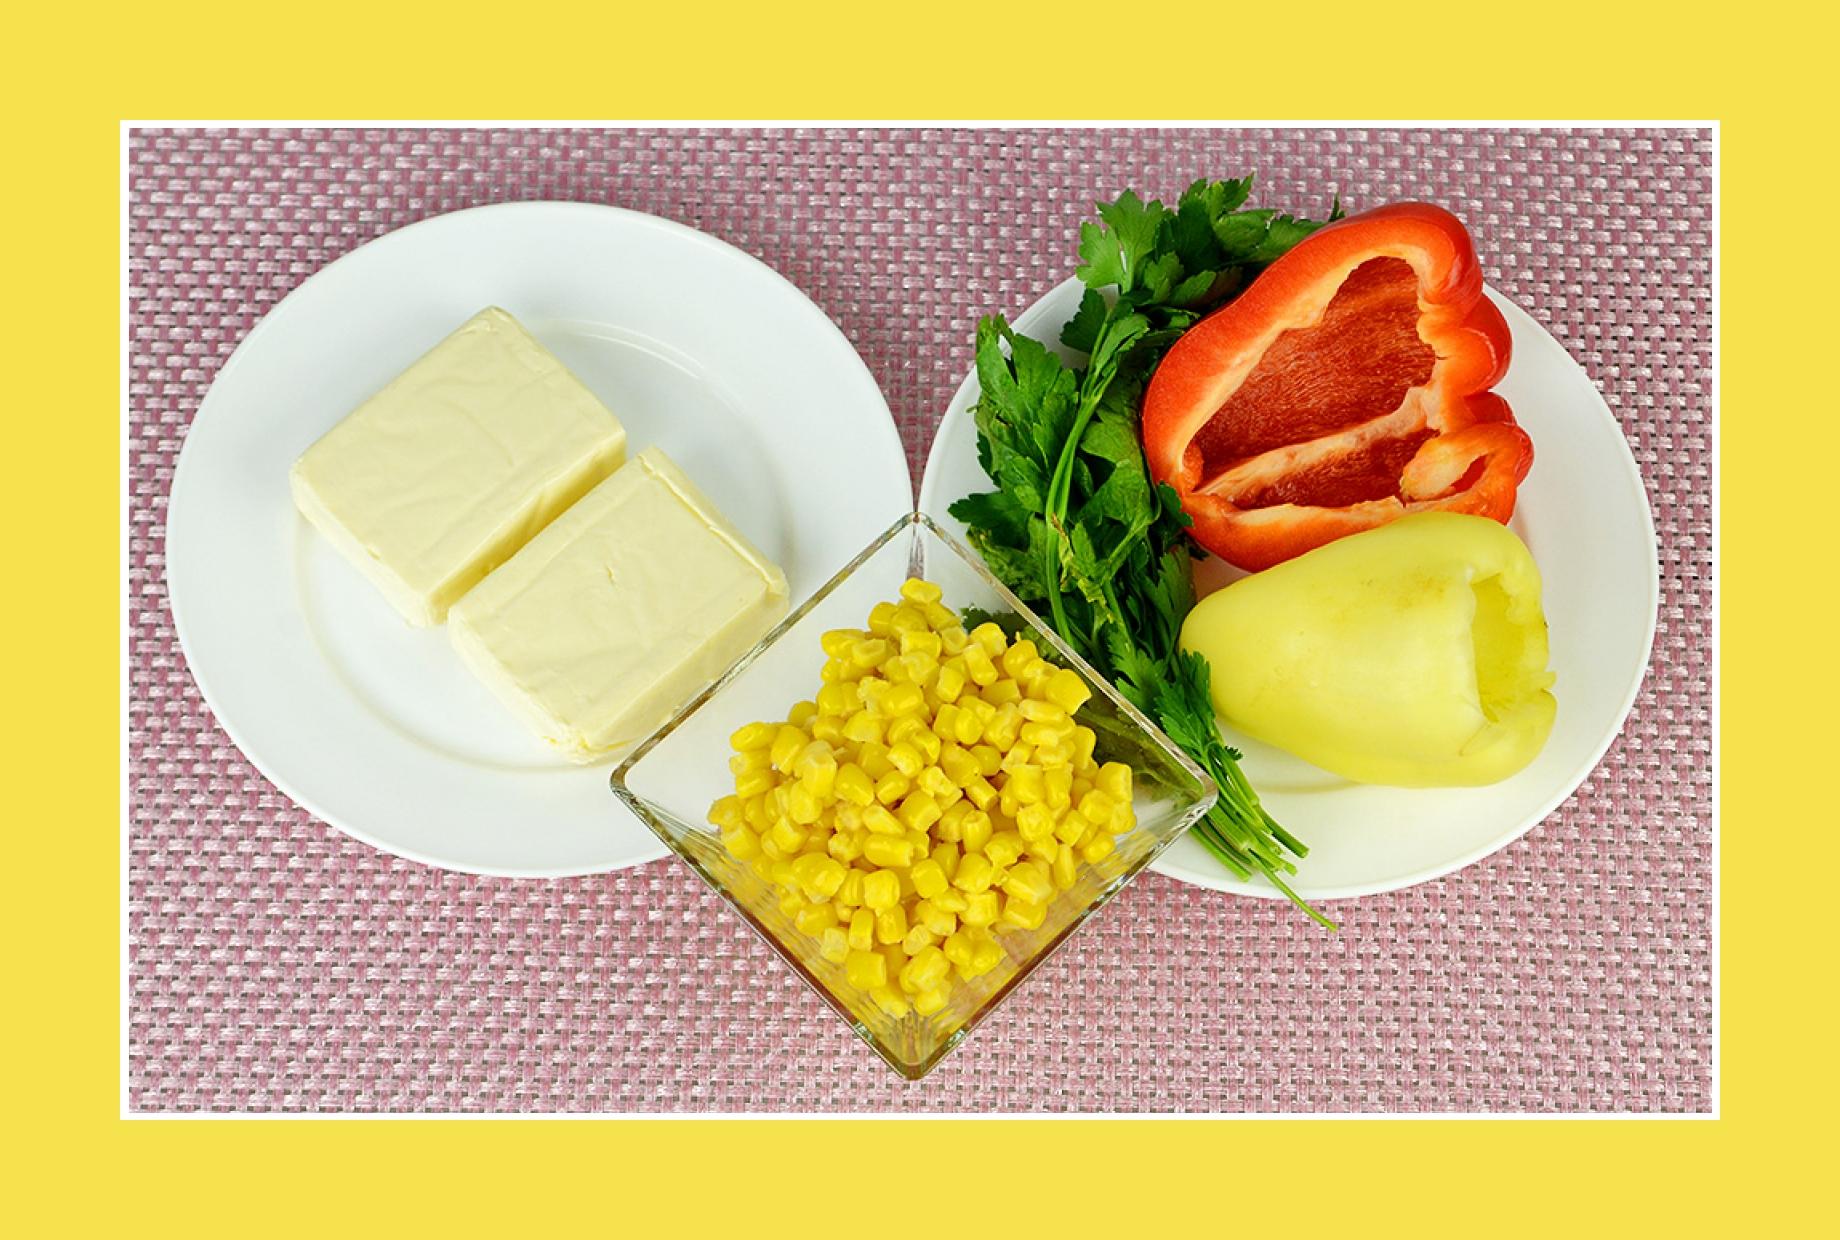 Salat mit wenigen Kalorien mit Paprika, Schmelzkäse, Mais, Petersilie